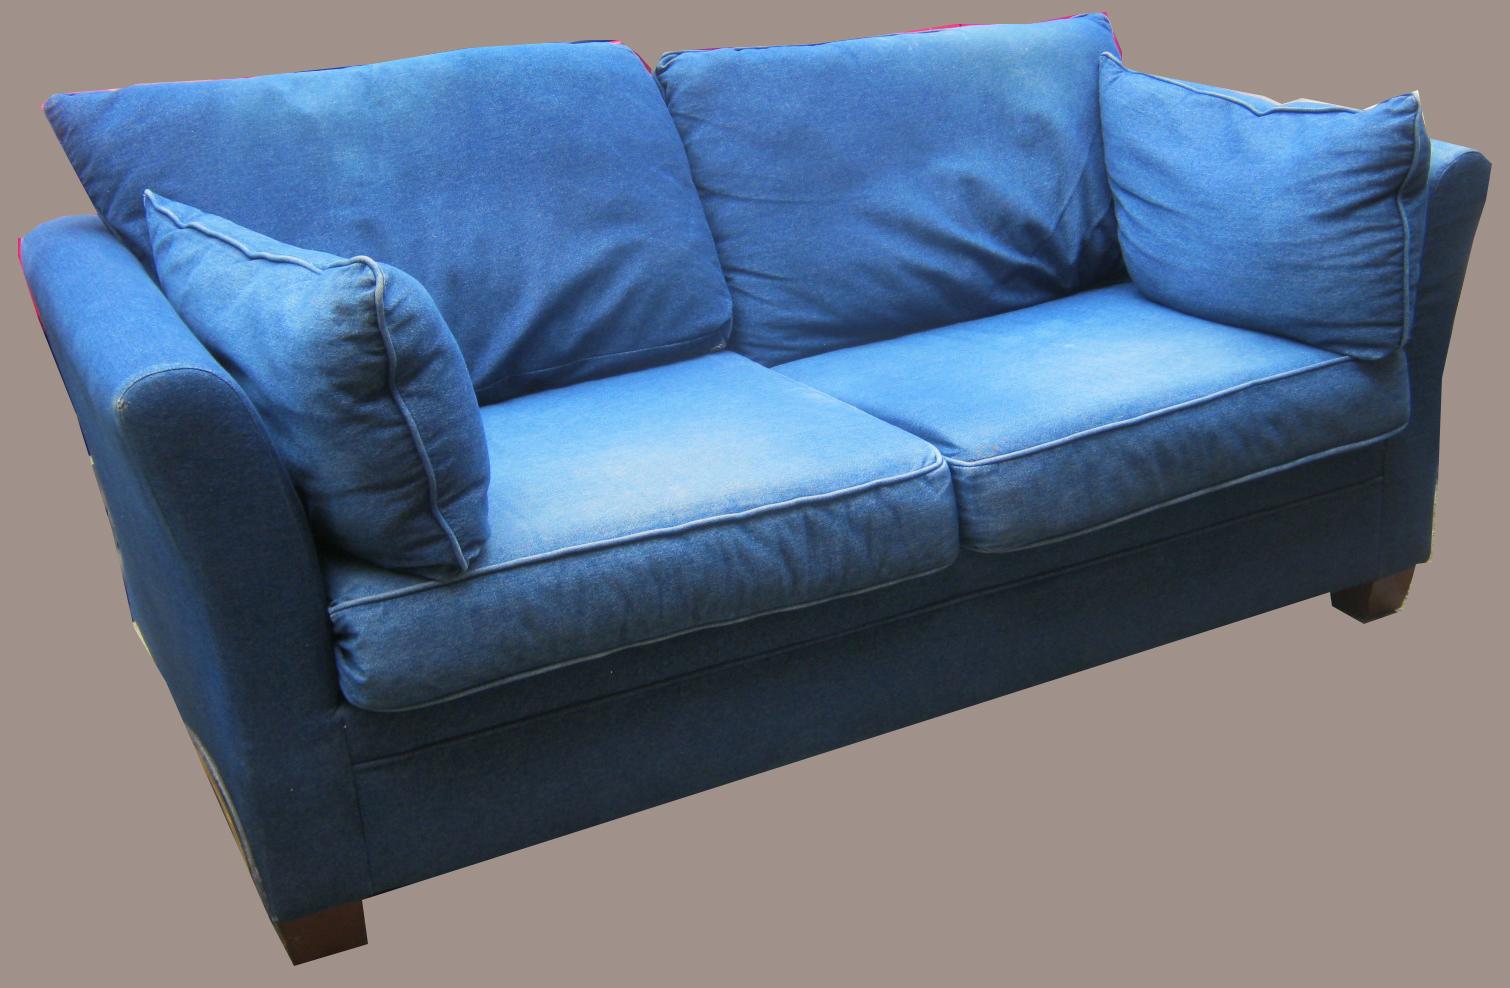 Uhuru Furniture Amp Collectibles Denim Sofa Sold